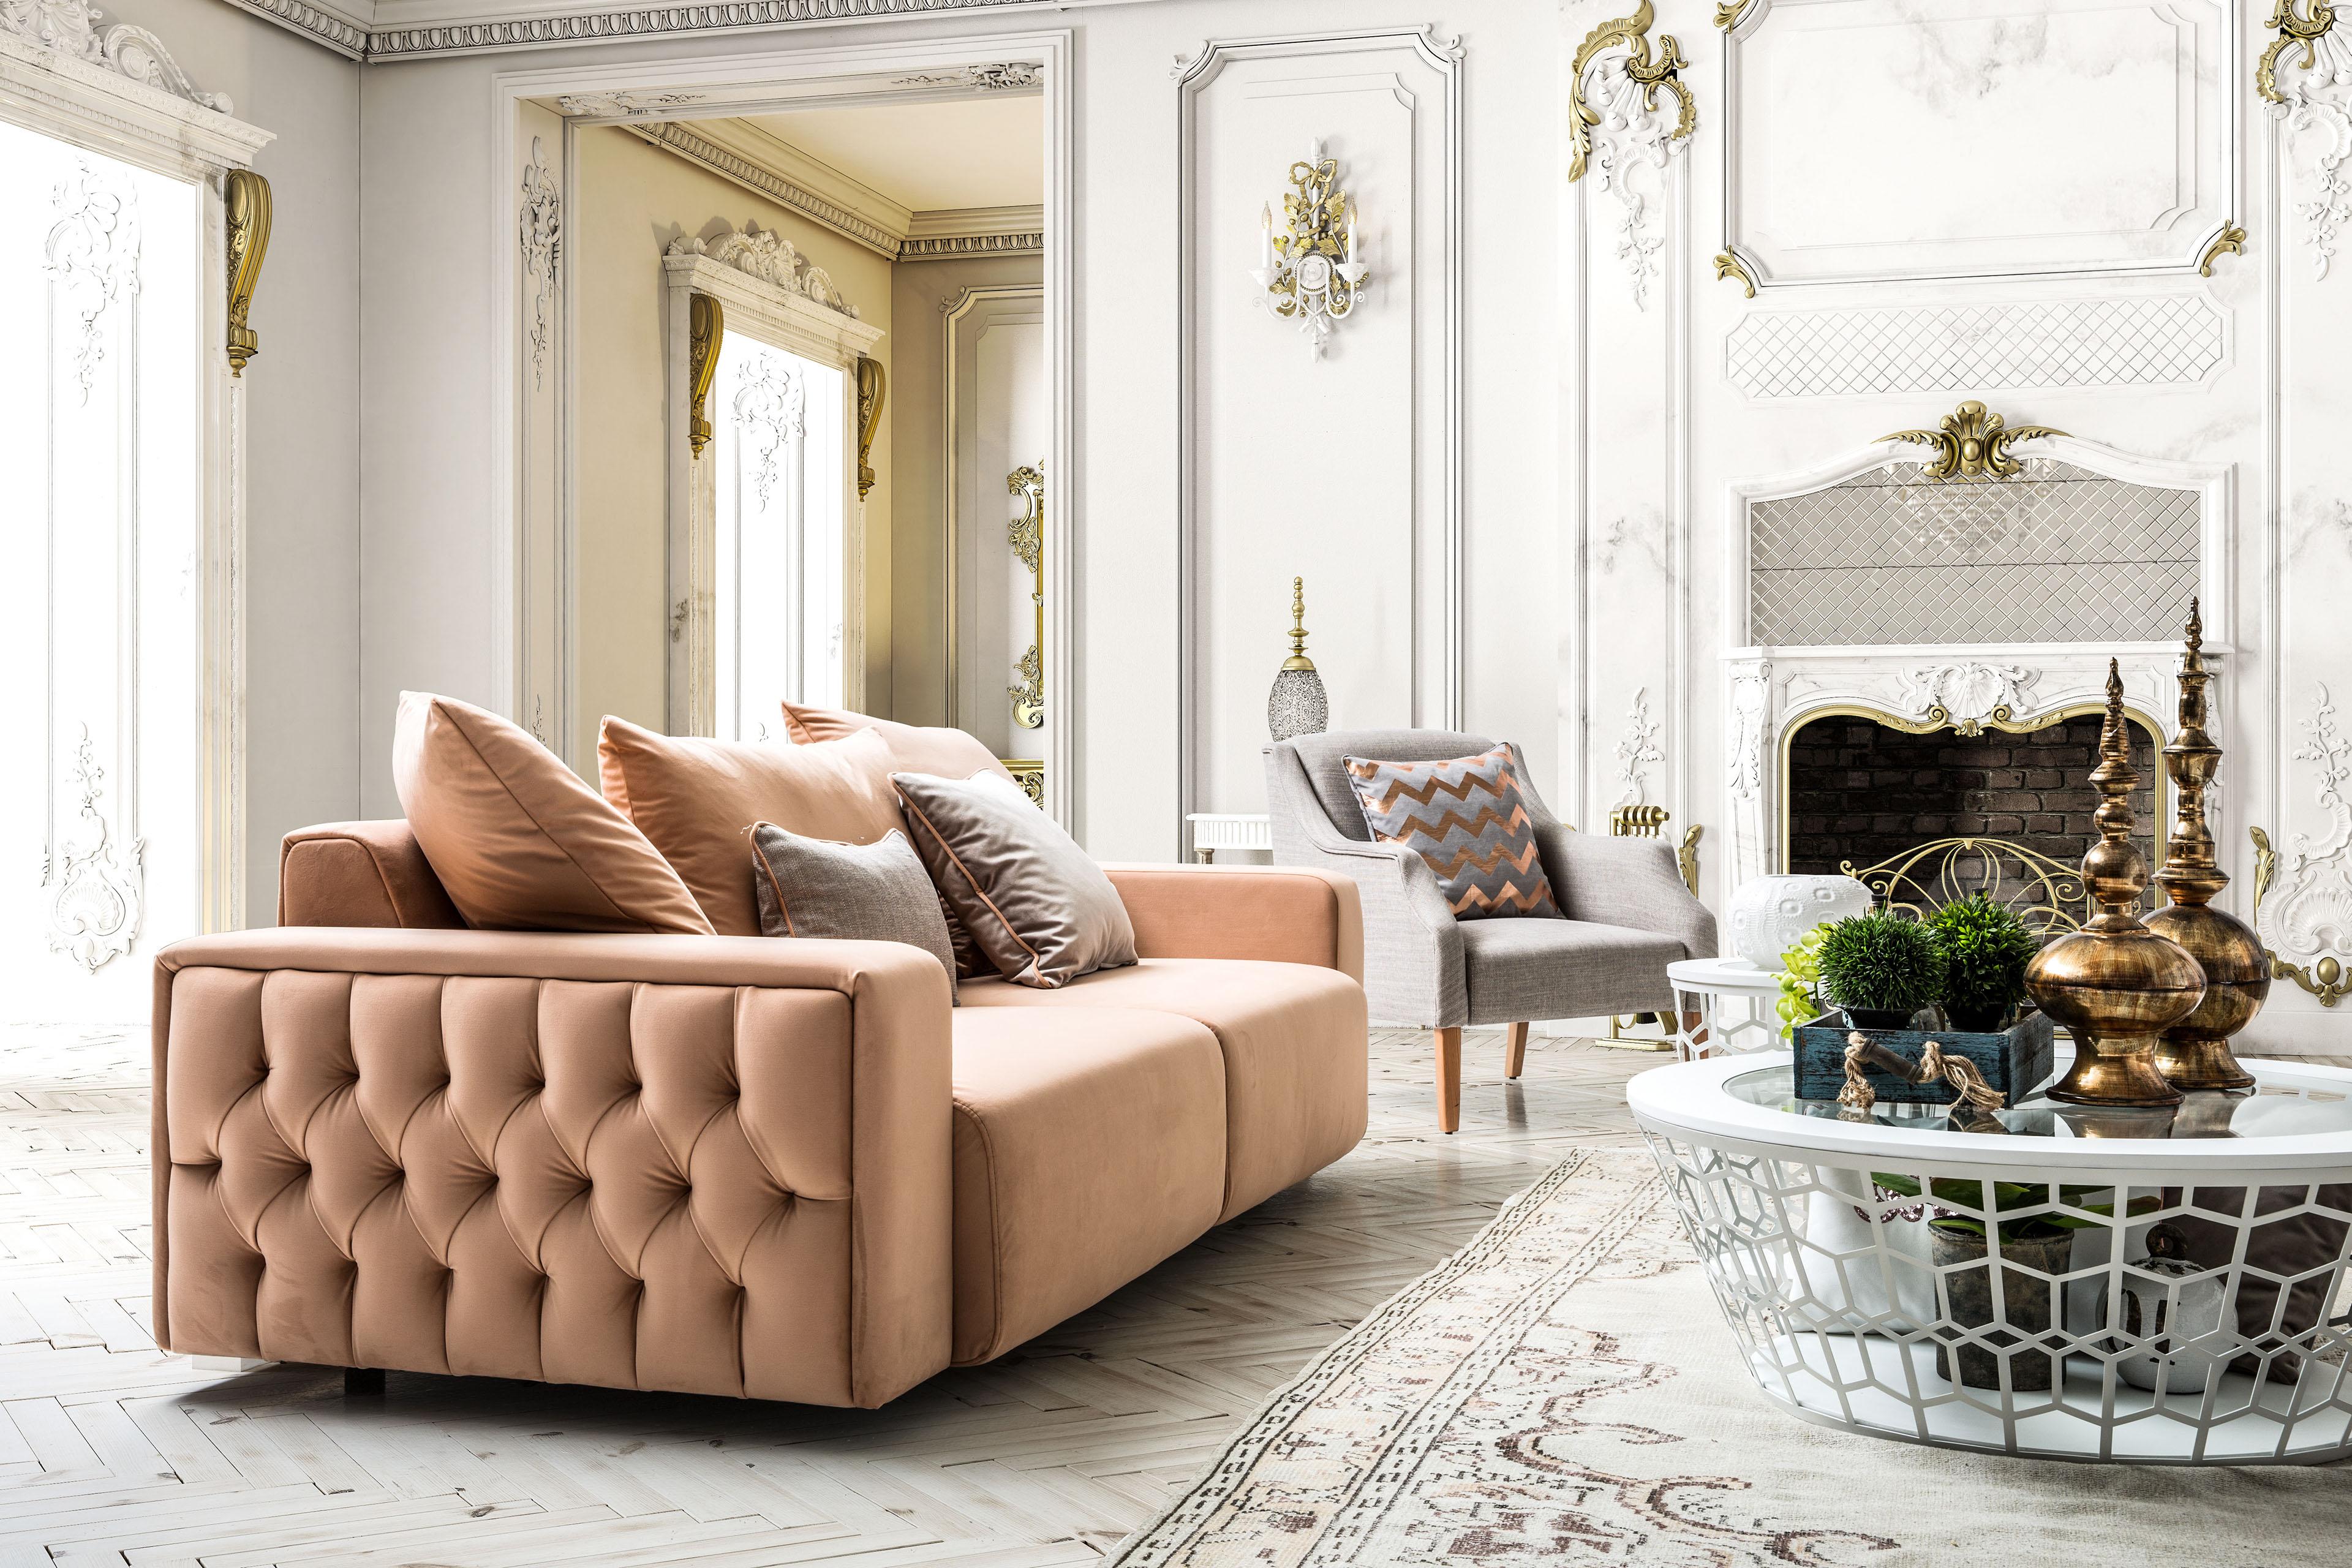 Infinity Sofa for Saloni Furniture on Behance